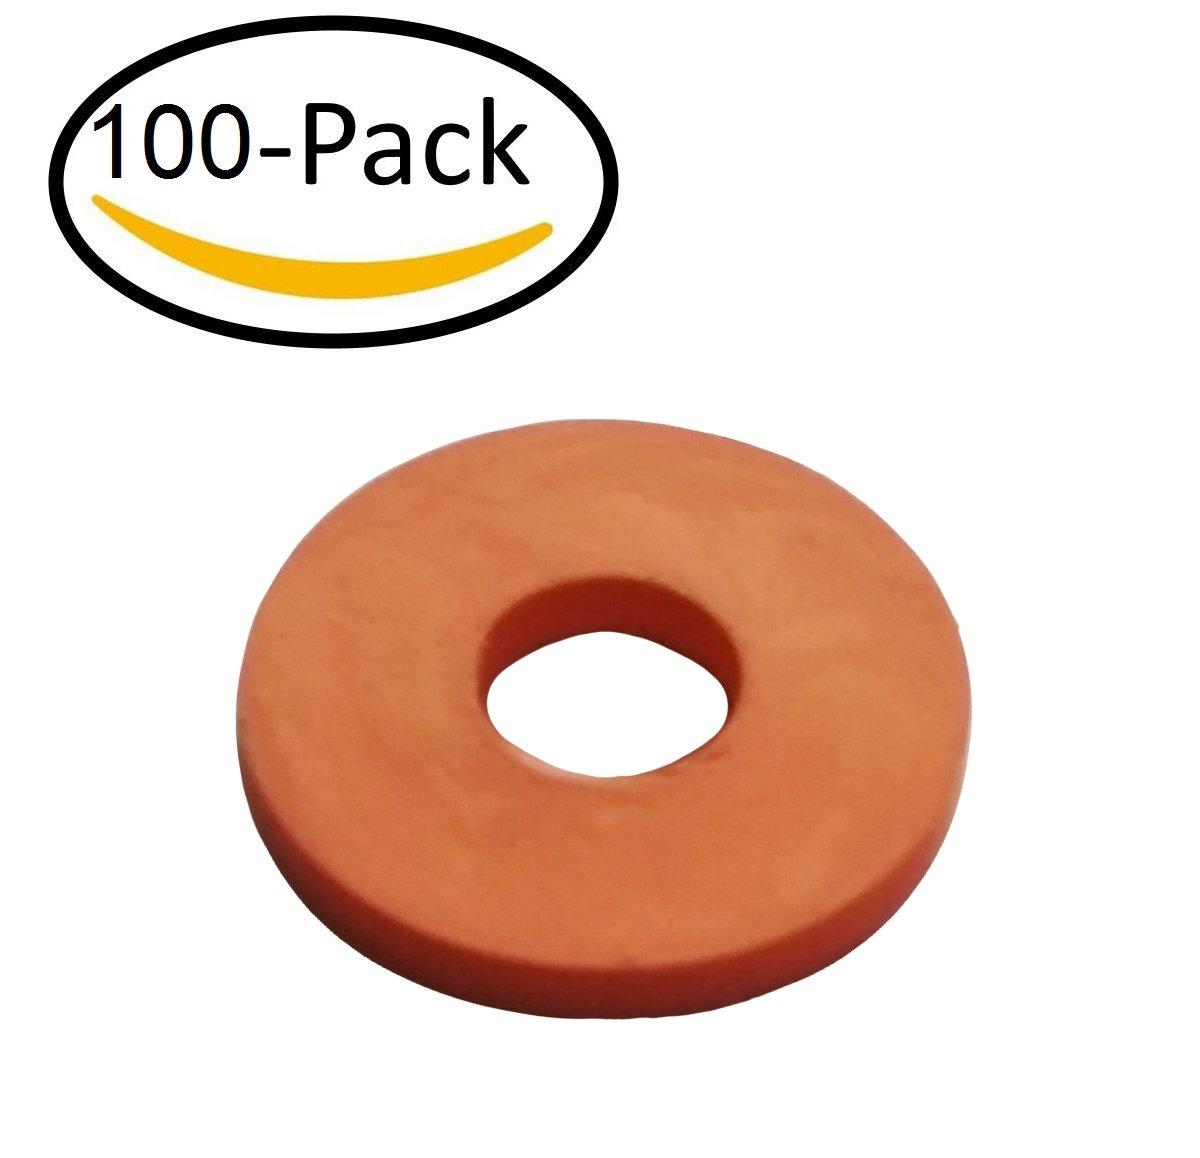 Grolsch Gaskets for Flip Top Bottles Pack of 100 Pieces C6614x100